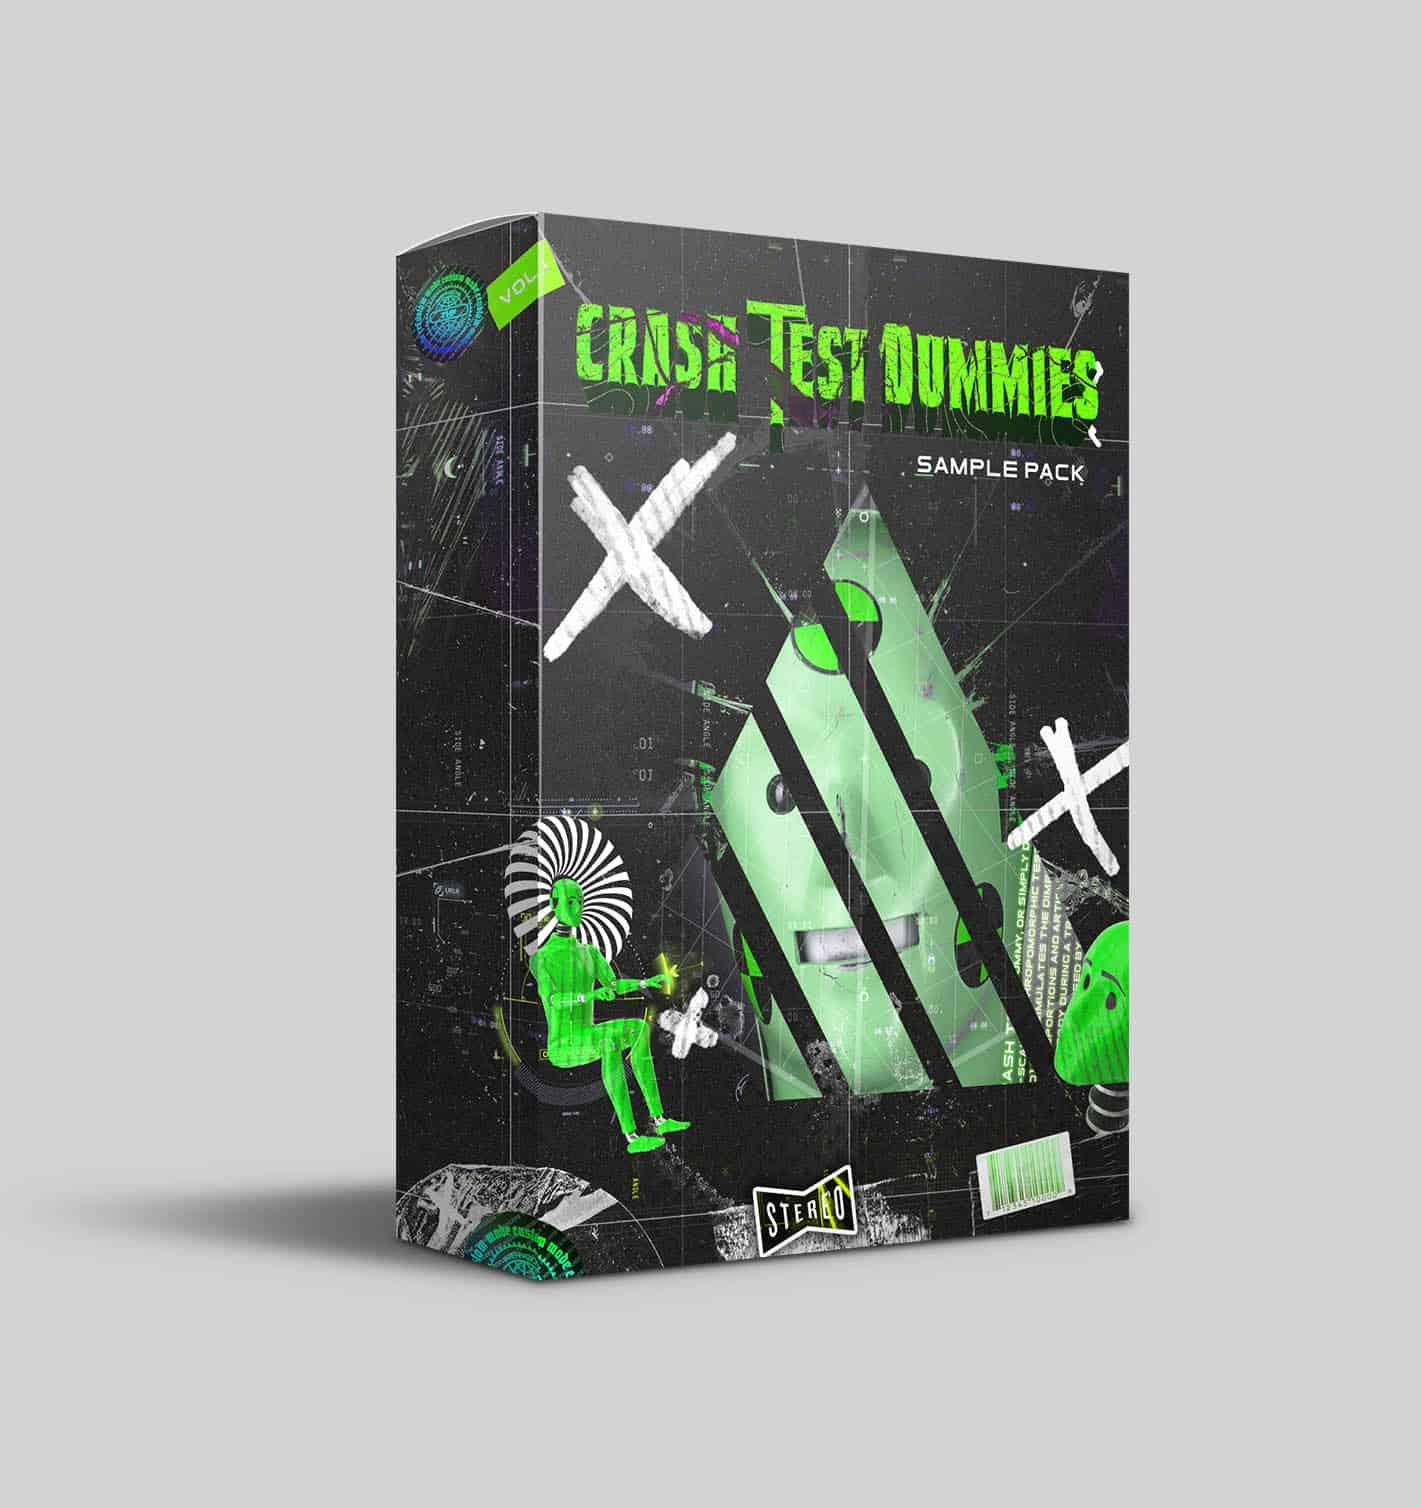 Crash Test Dummies Hip-Hop Sample Pack